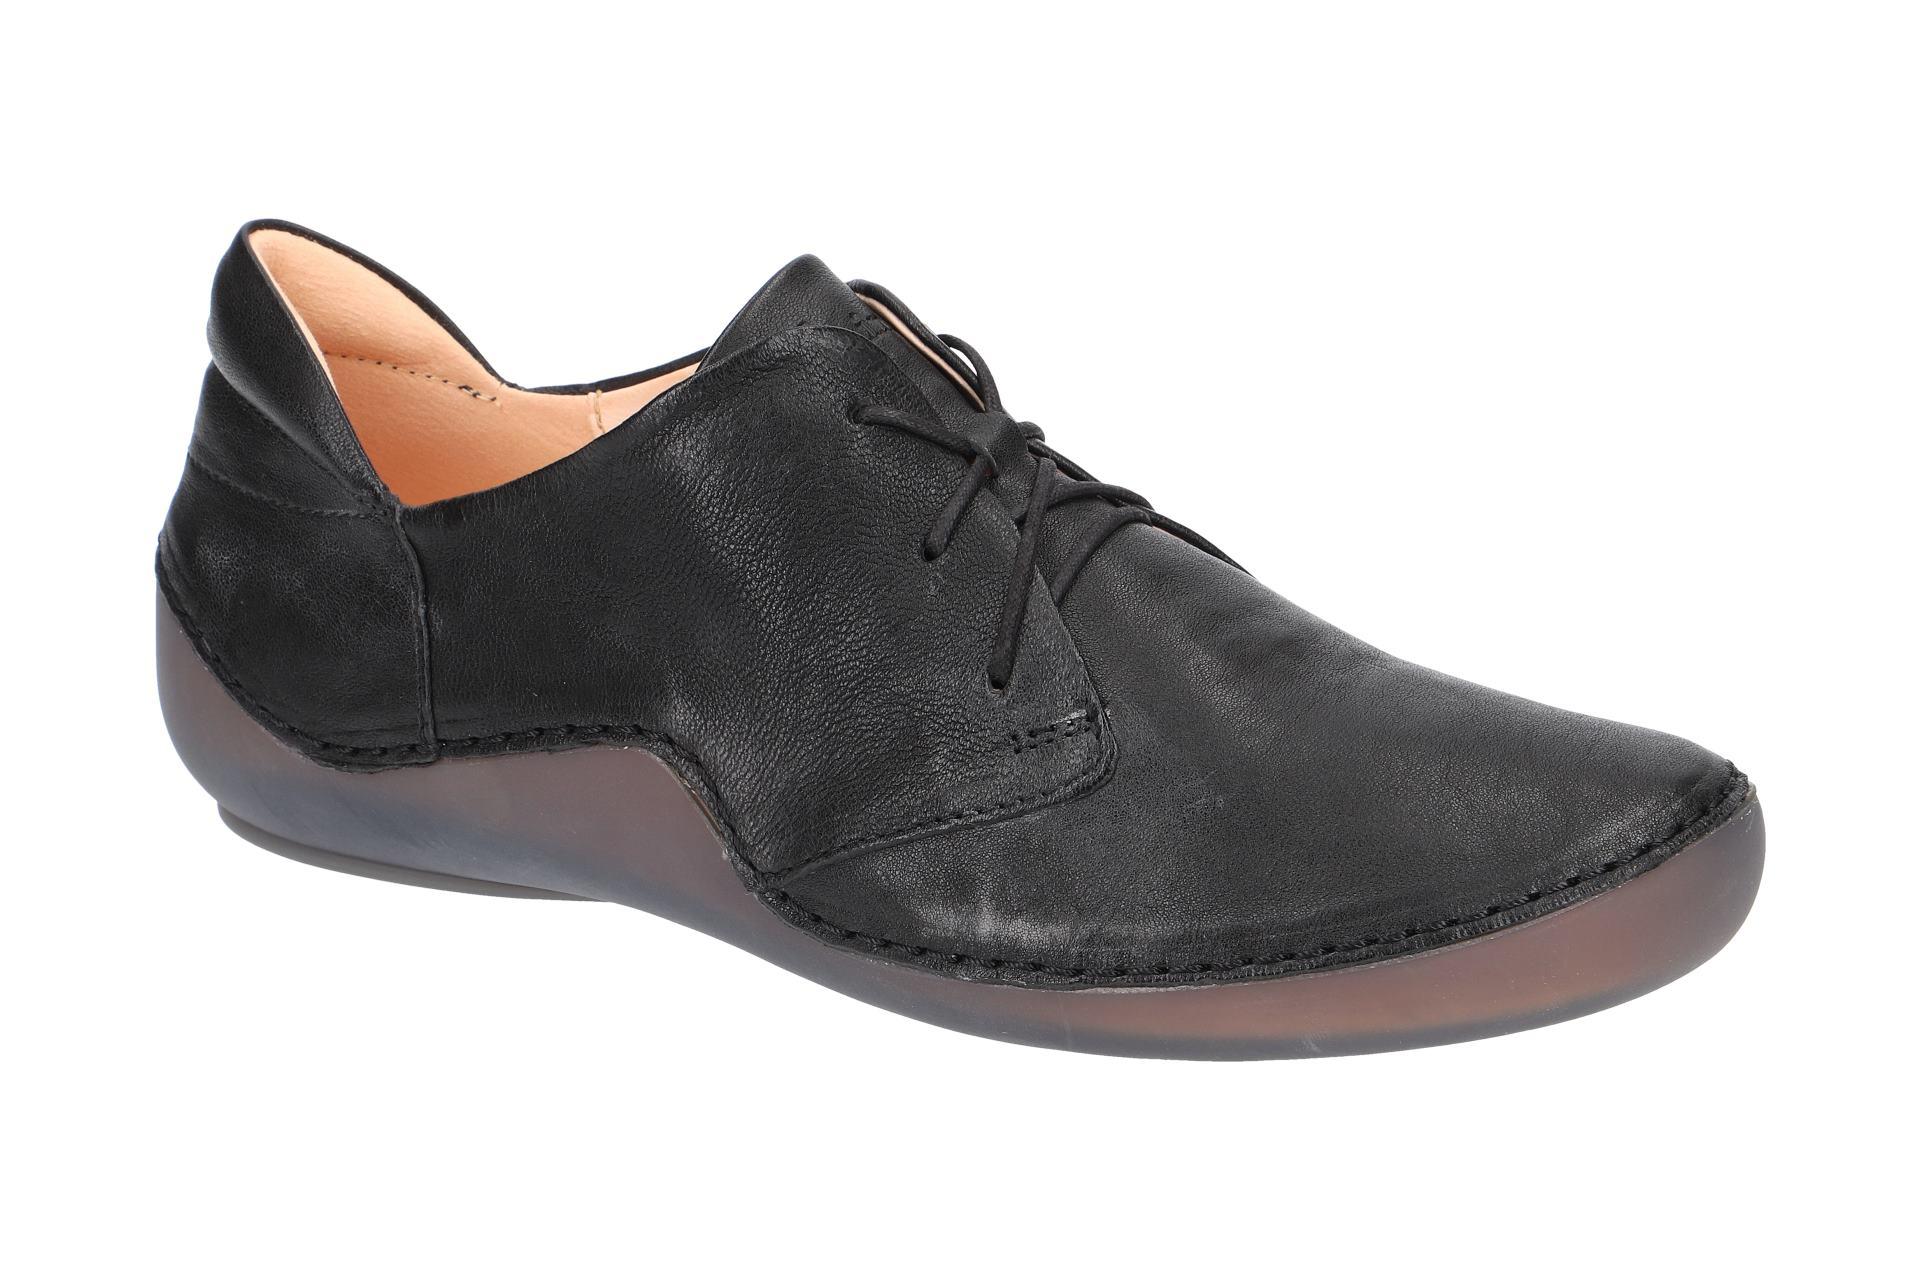 Think Kapsl Schuhe schwarz Damen Schnürer